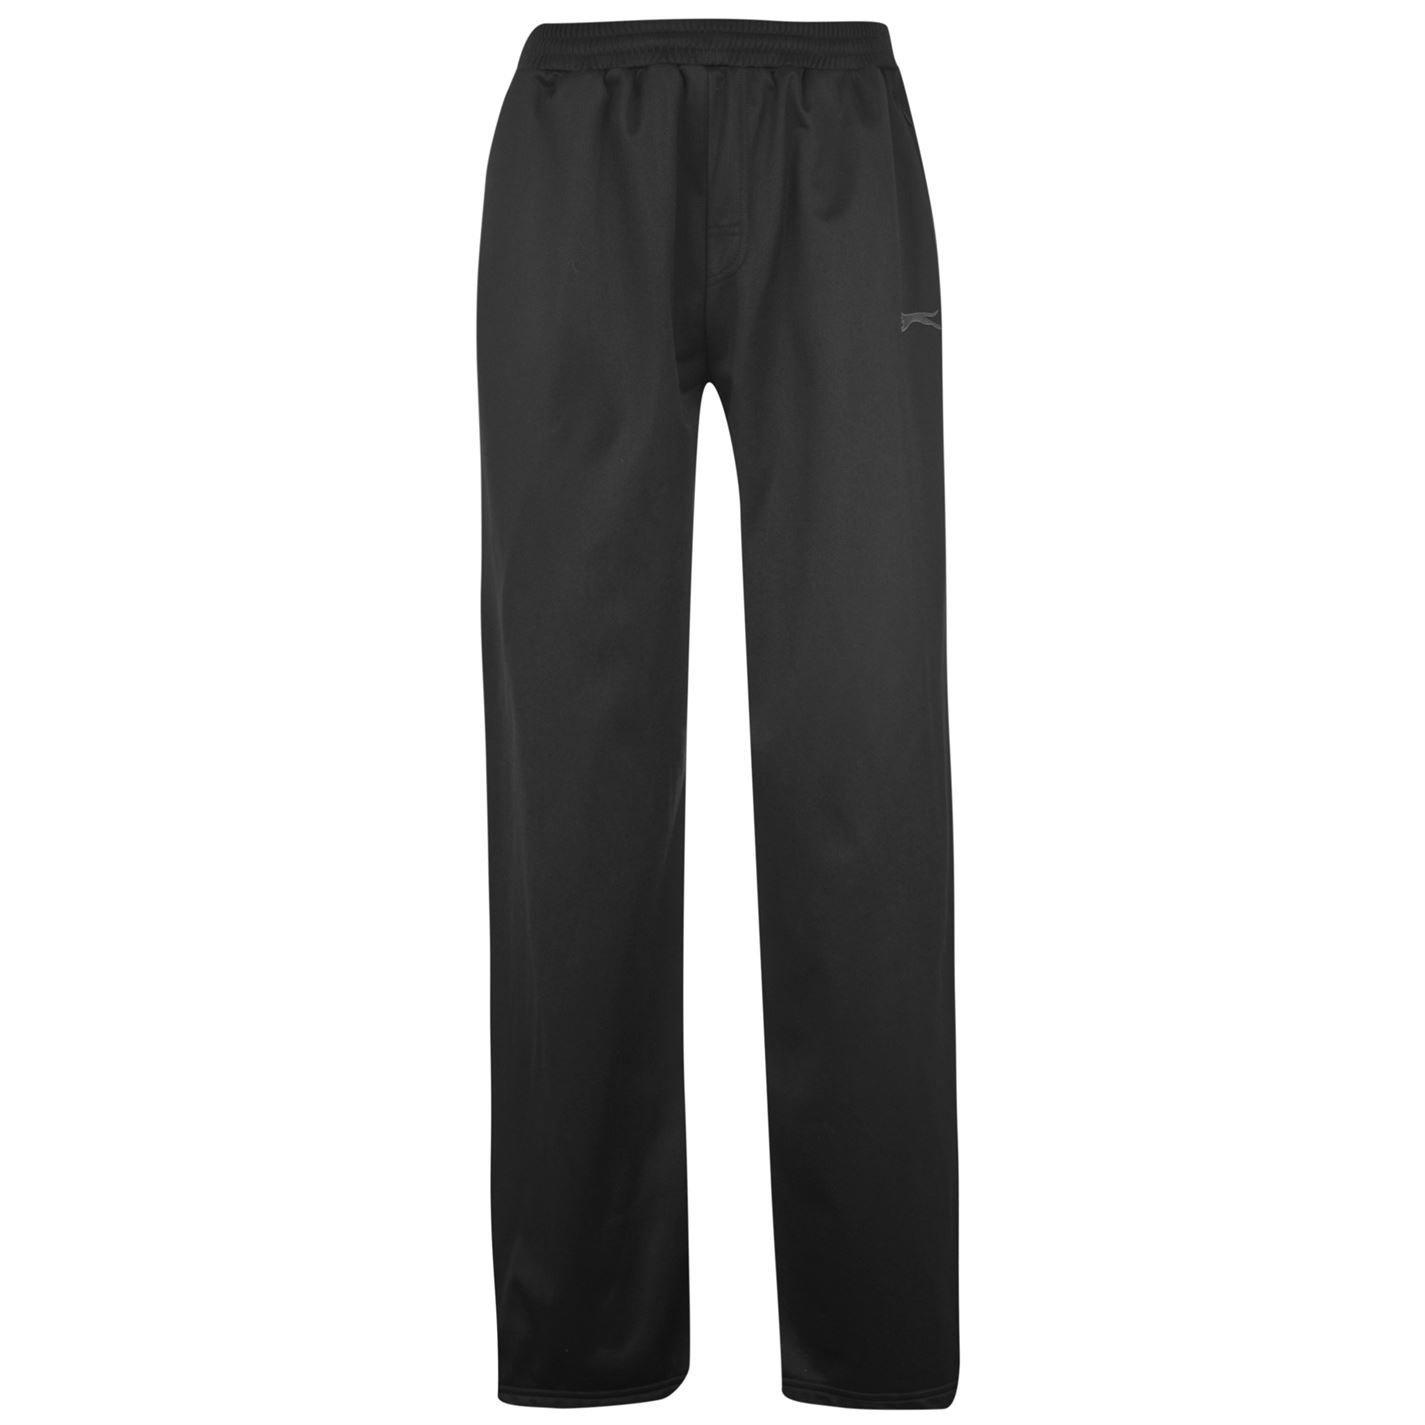 05d154ca65e Slazenger Mens Poly Pants Gents Sports Training Running Tracksuit Bottoms:  Amazon.co.uk: Sports & Outdoors